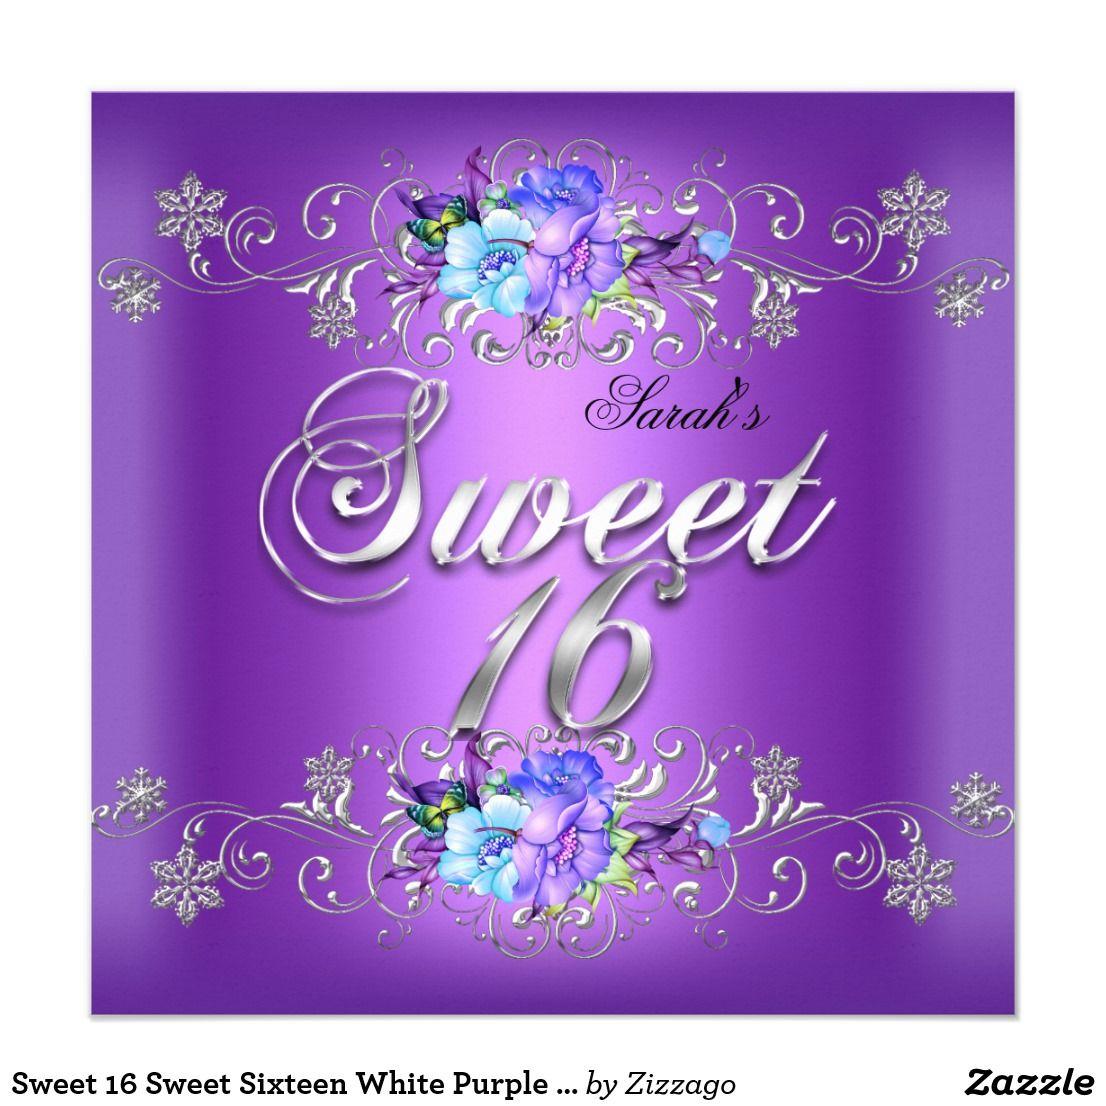 Sweet 16 sweet sixteen white purple flowers card sweet 16 sweet sweet 16 sweet sixteen white purple flowers card sweet 16 sweet sixteen white blue purple flowers izmirmasajfo